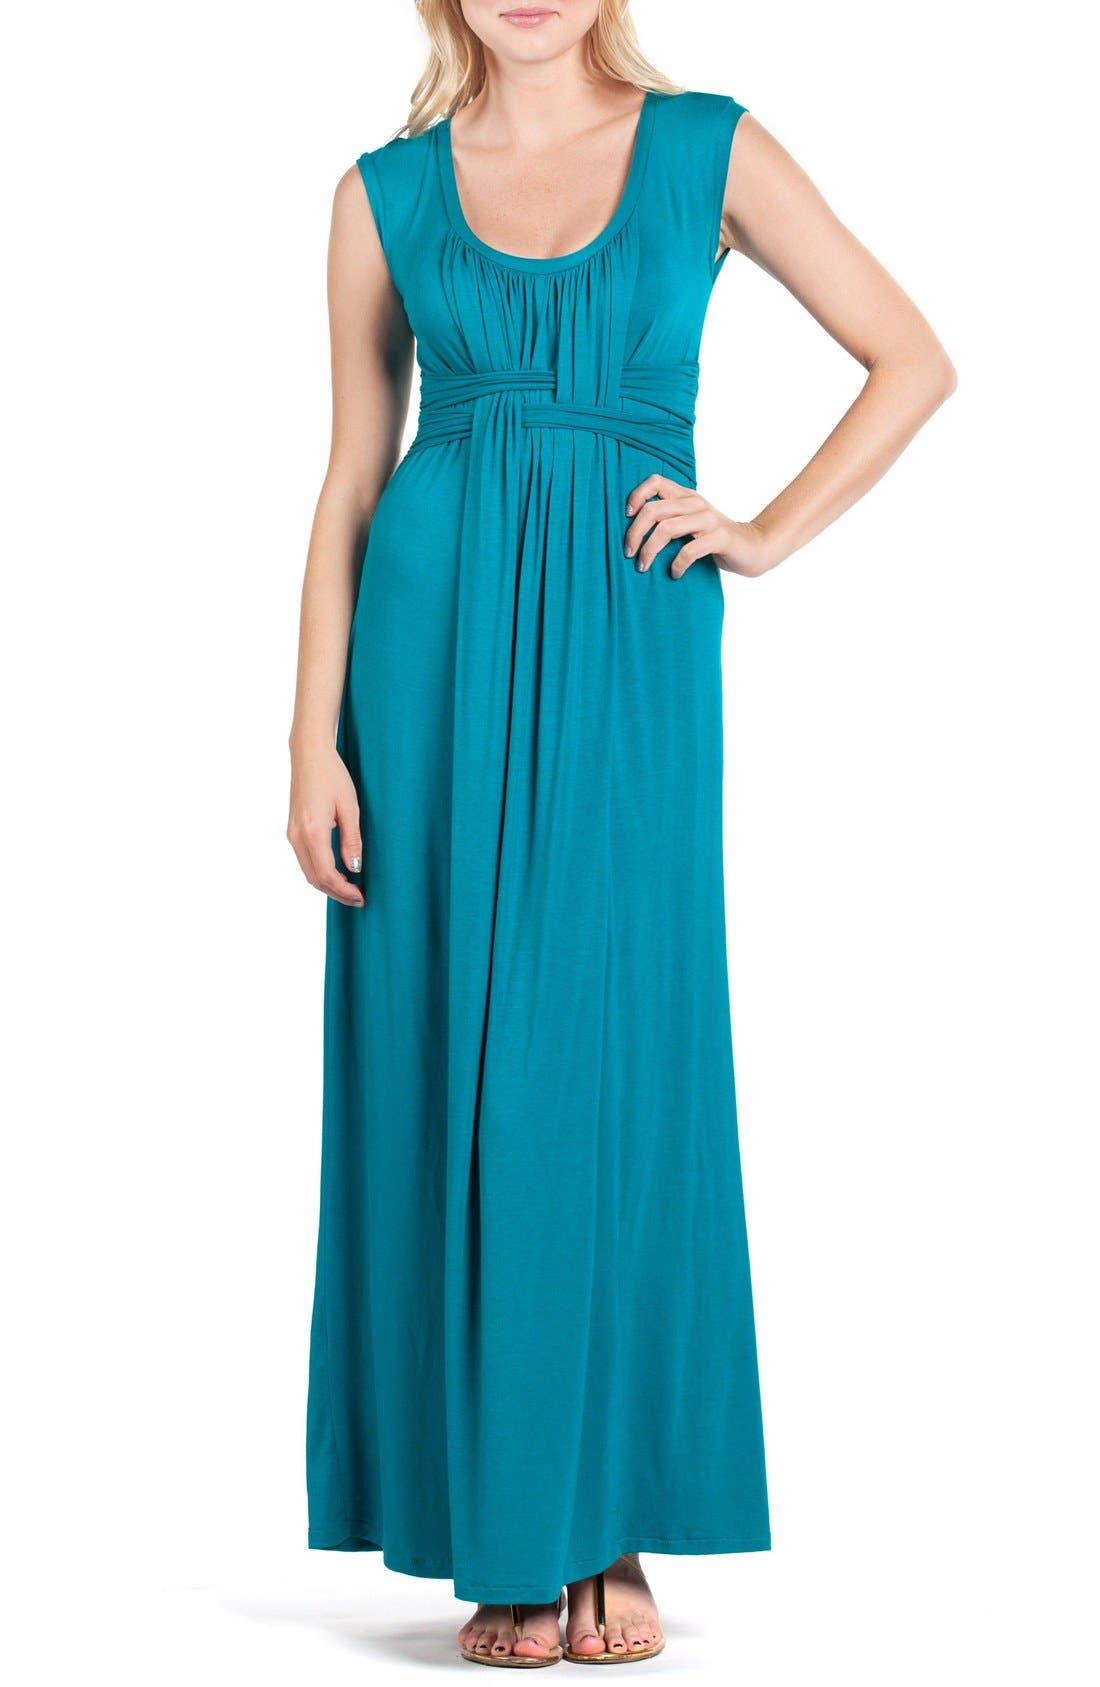 Athens Maternity/Nursing Maxi Dress,                         Main,                         color, JADE